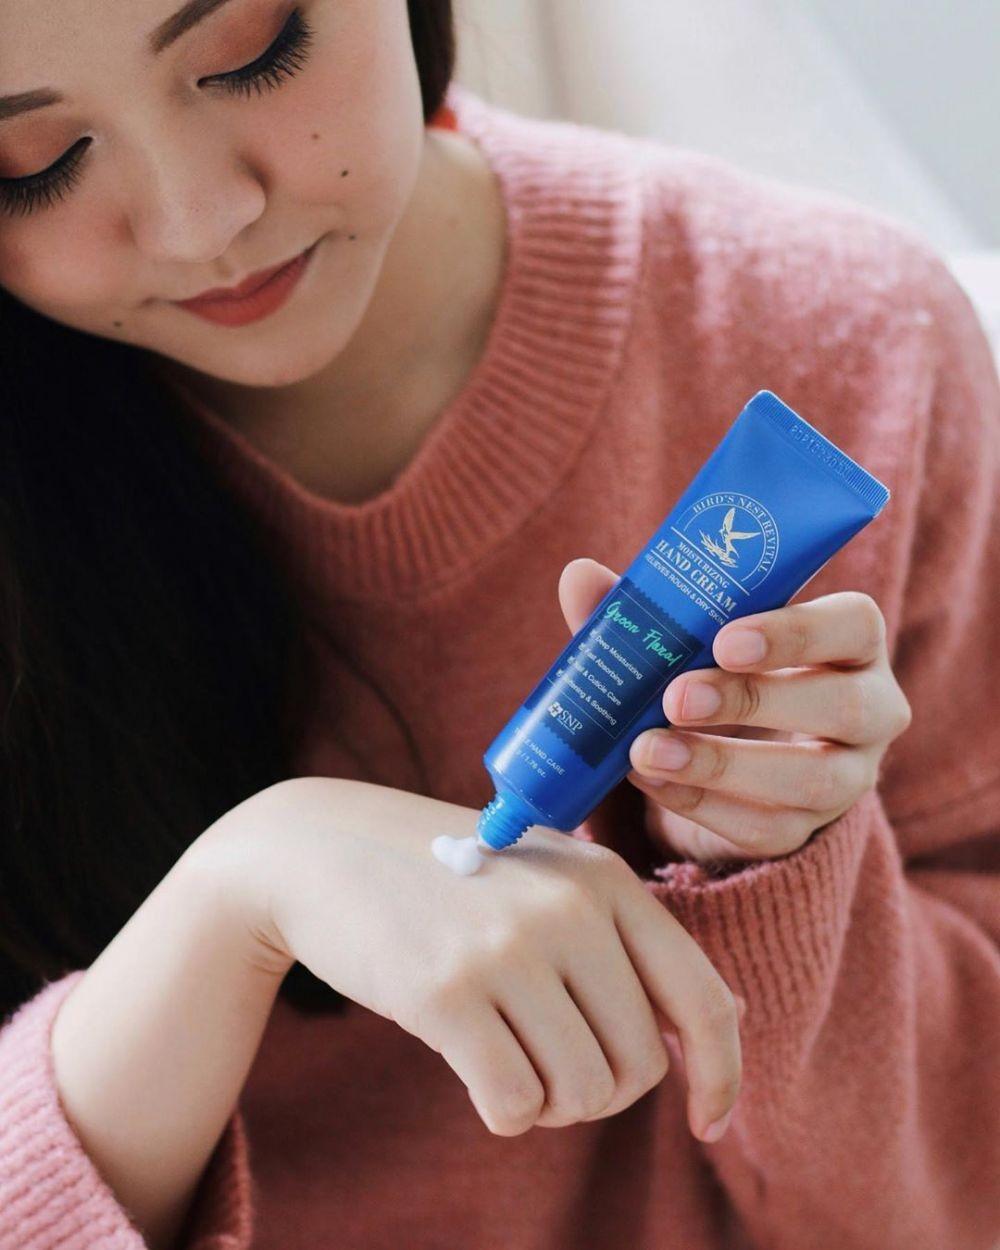 6 Rekomendasi Hand Cream Korea untuk Tangan Lembap dan Wangi Seharian